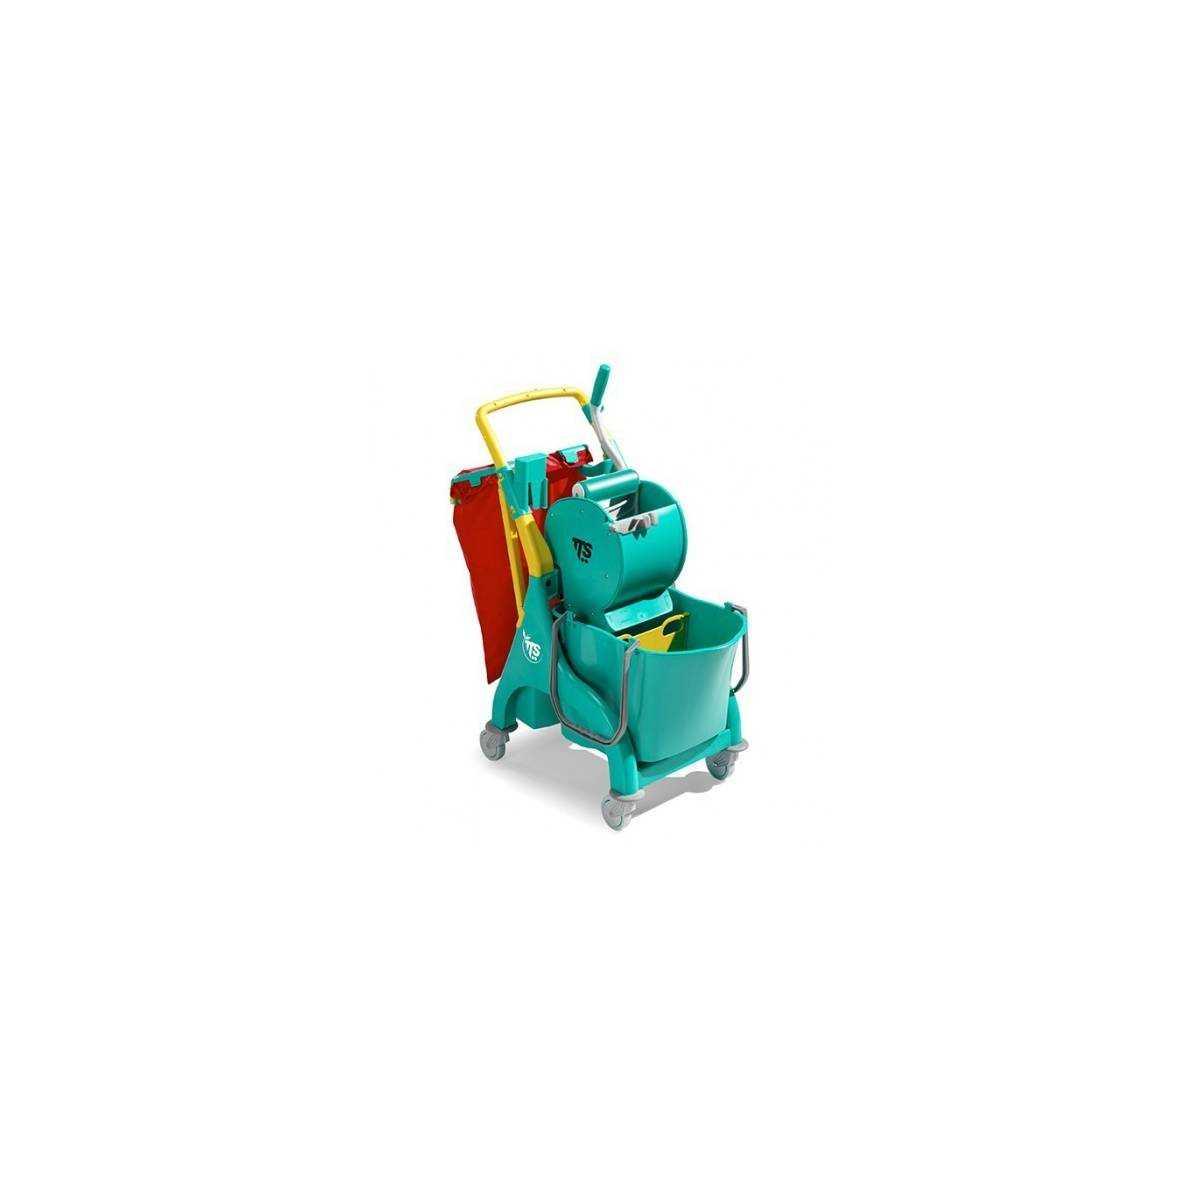 Тележка для уборки Nick Plus 70 (0P066509) 0P066509 TTS